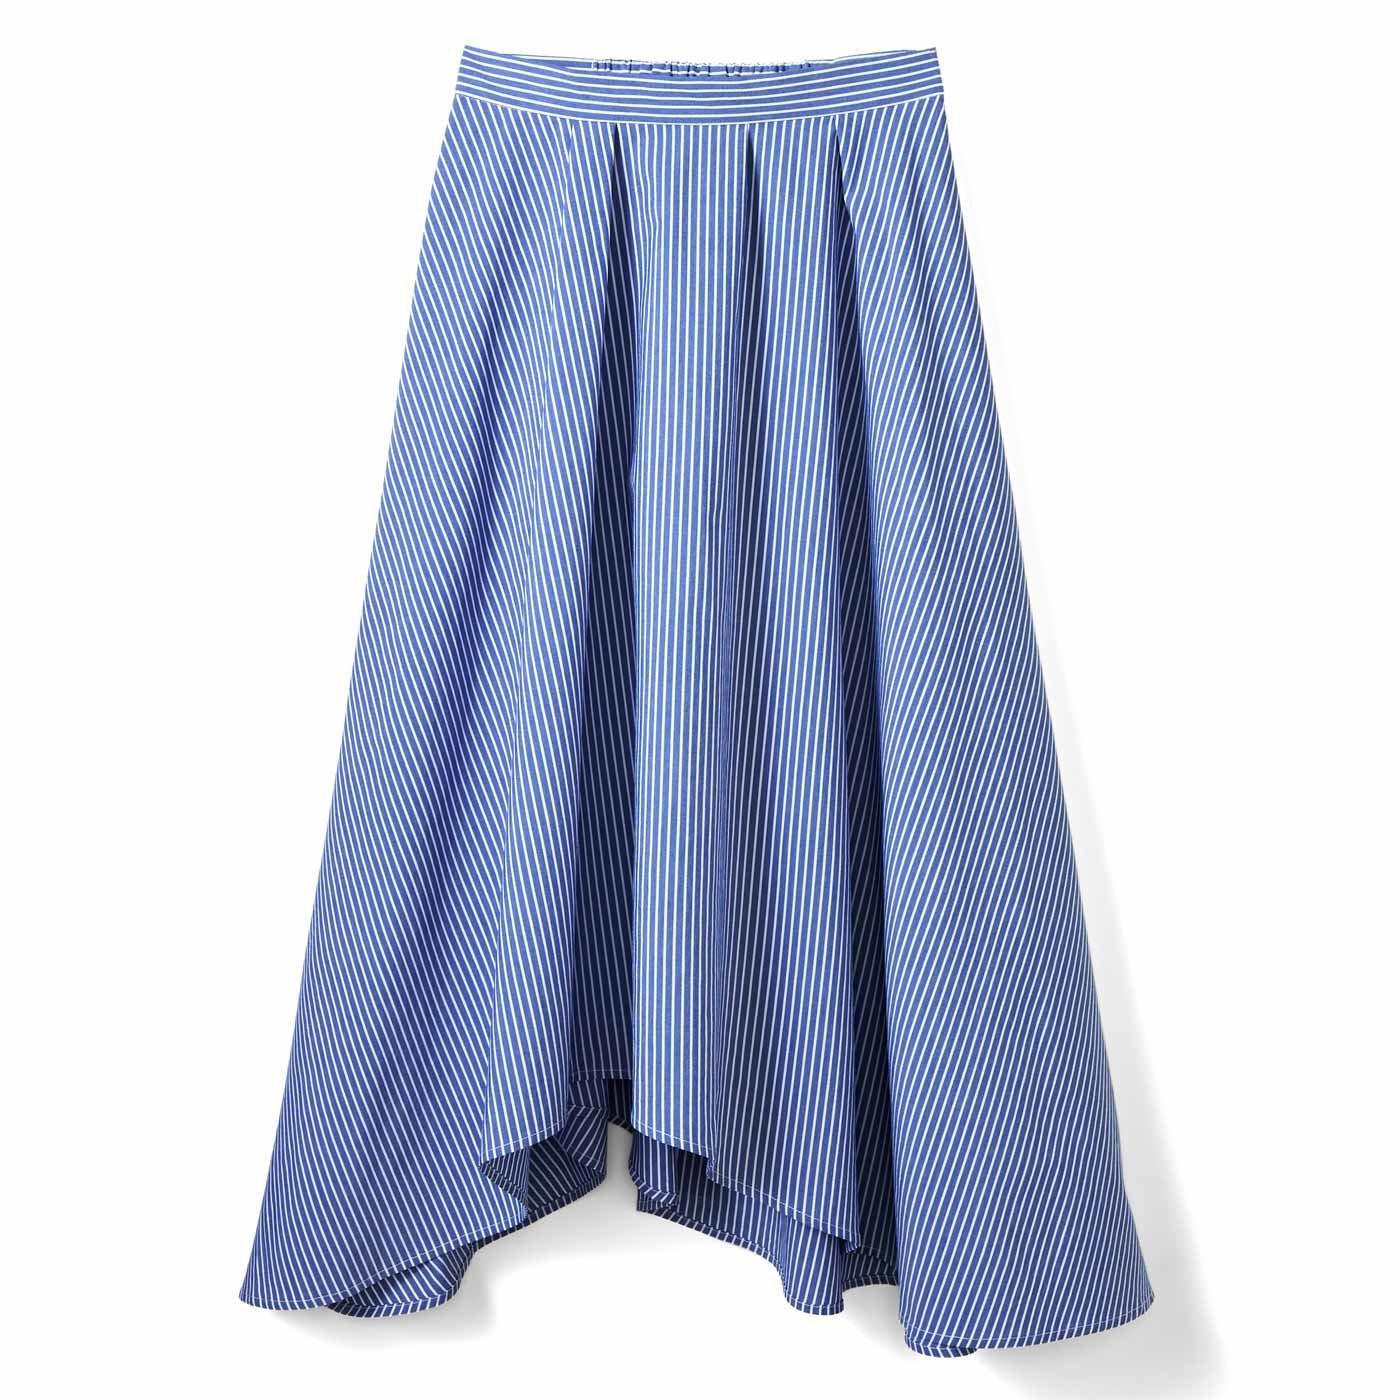 IEDIT[イディット] ストライプイレギュラーヘムスカート〈ブルー〉